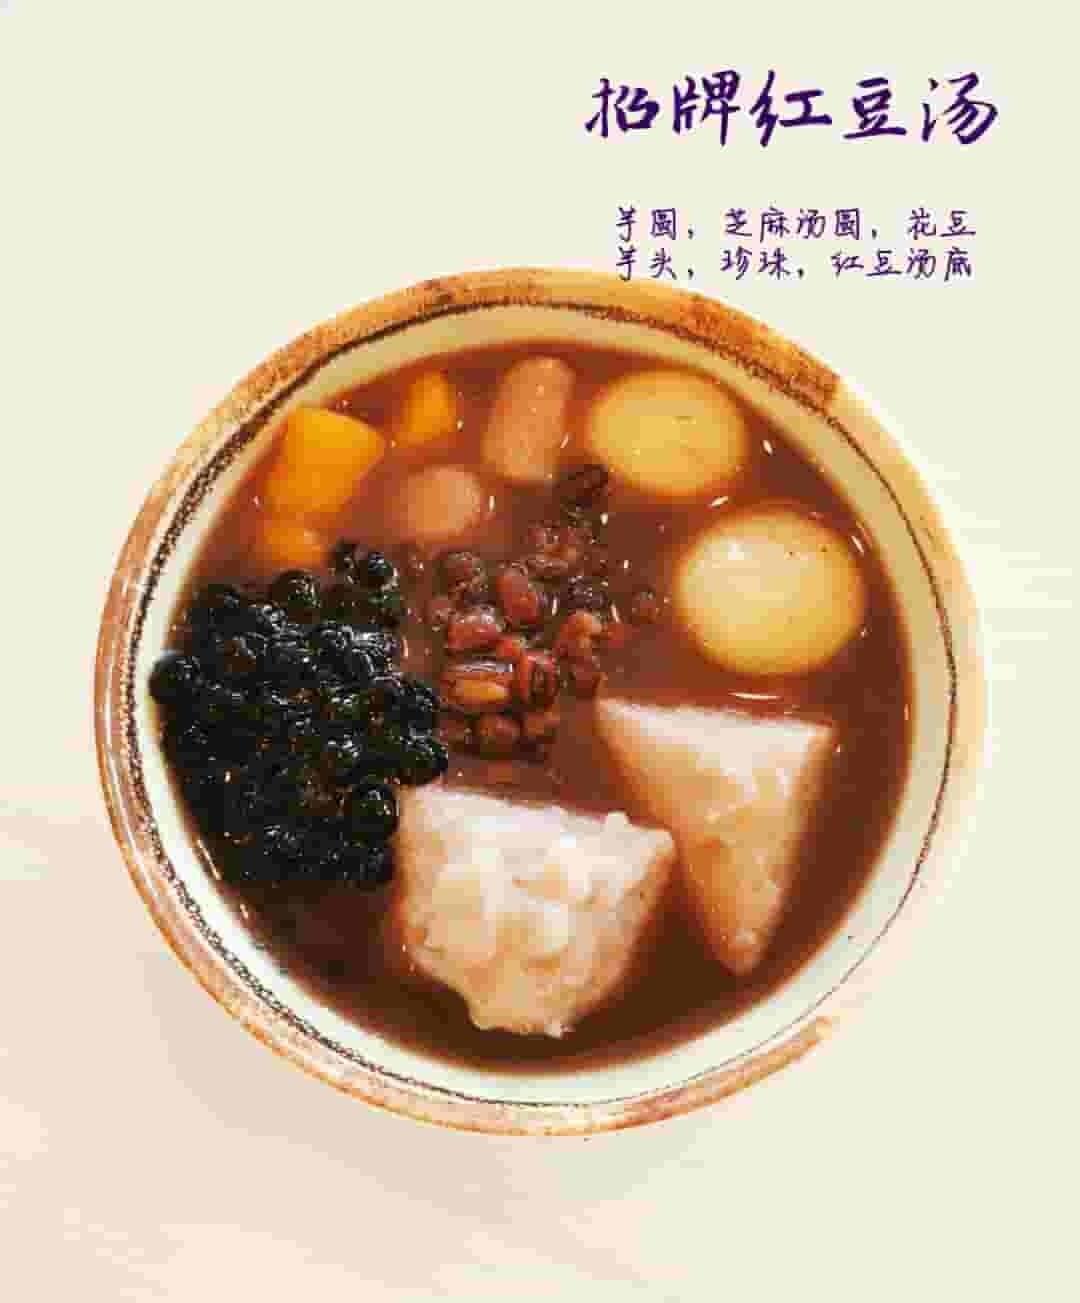 XYX【鲜芋仙】招牌红豆汤 Hot Red Bean Soup Signature